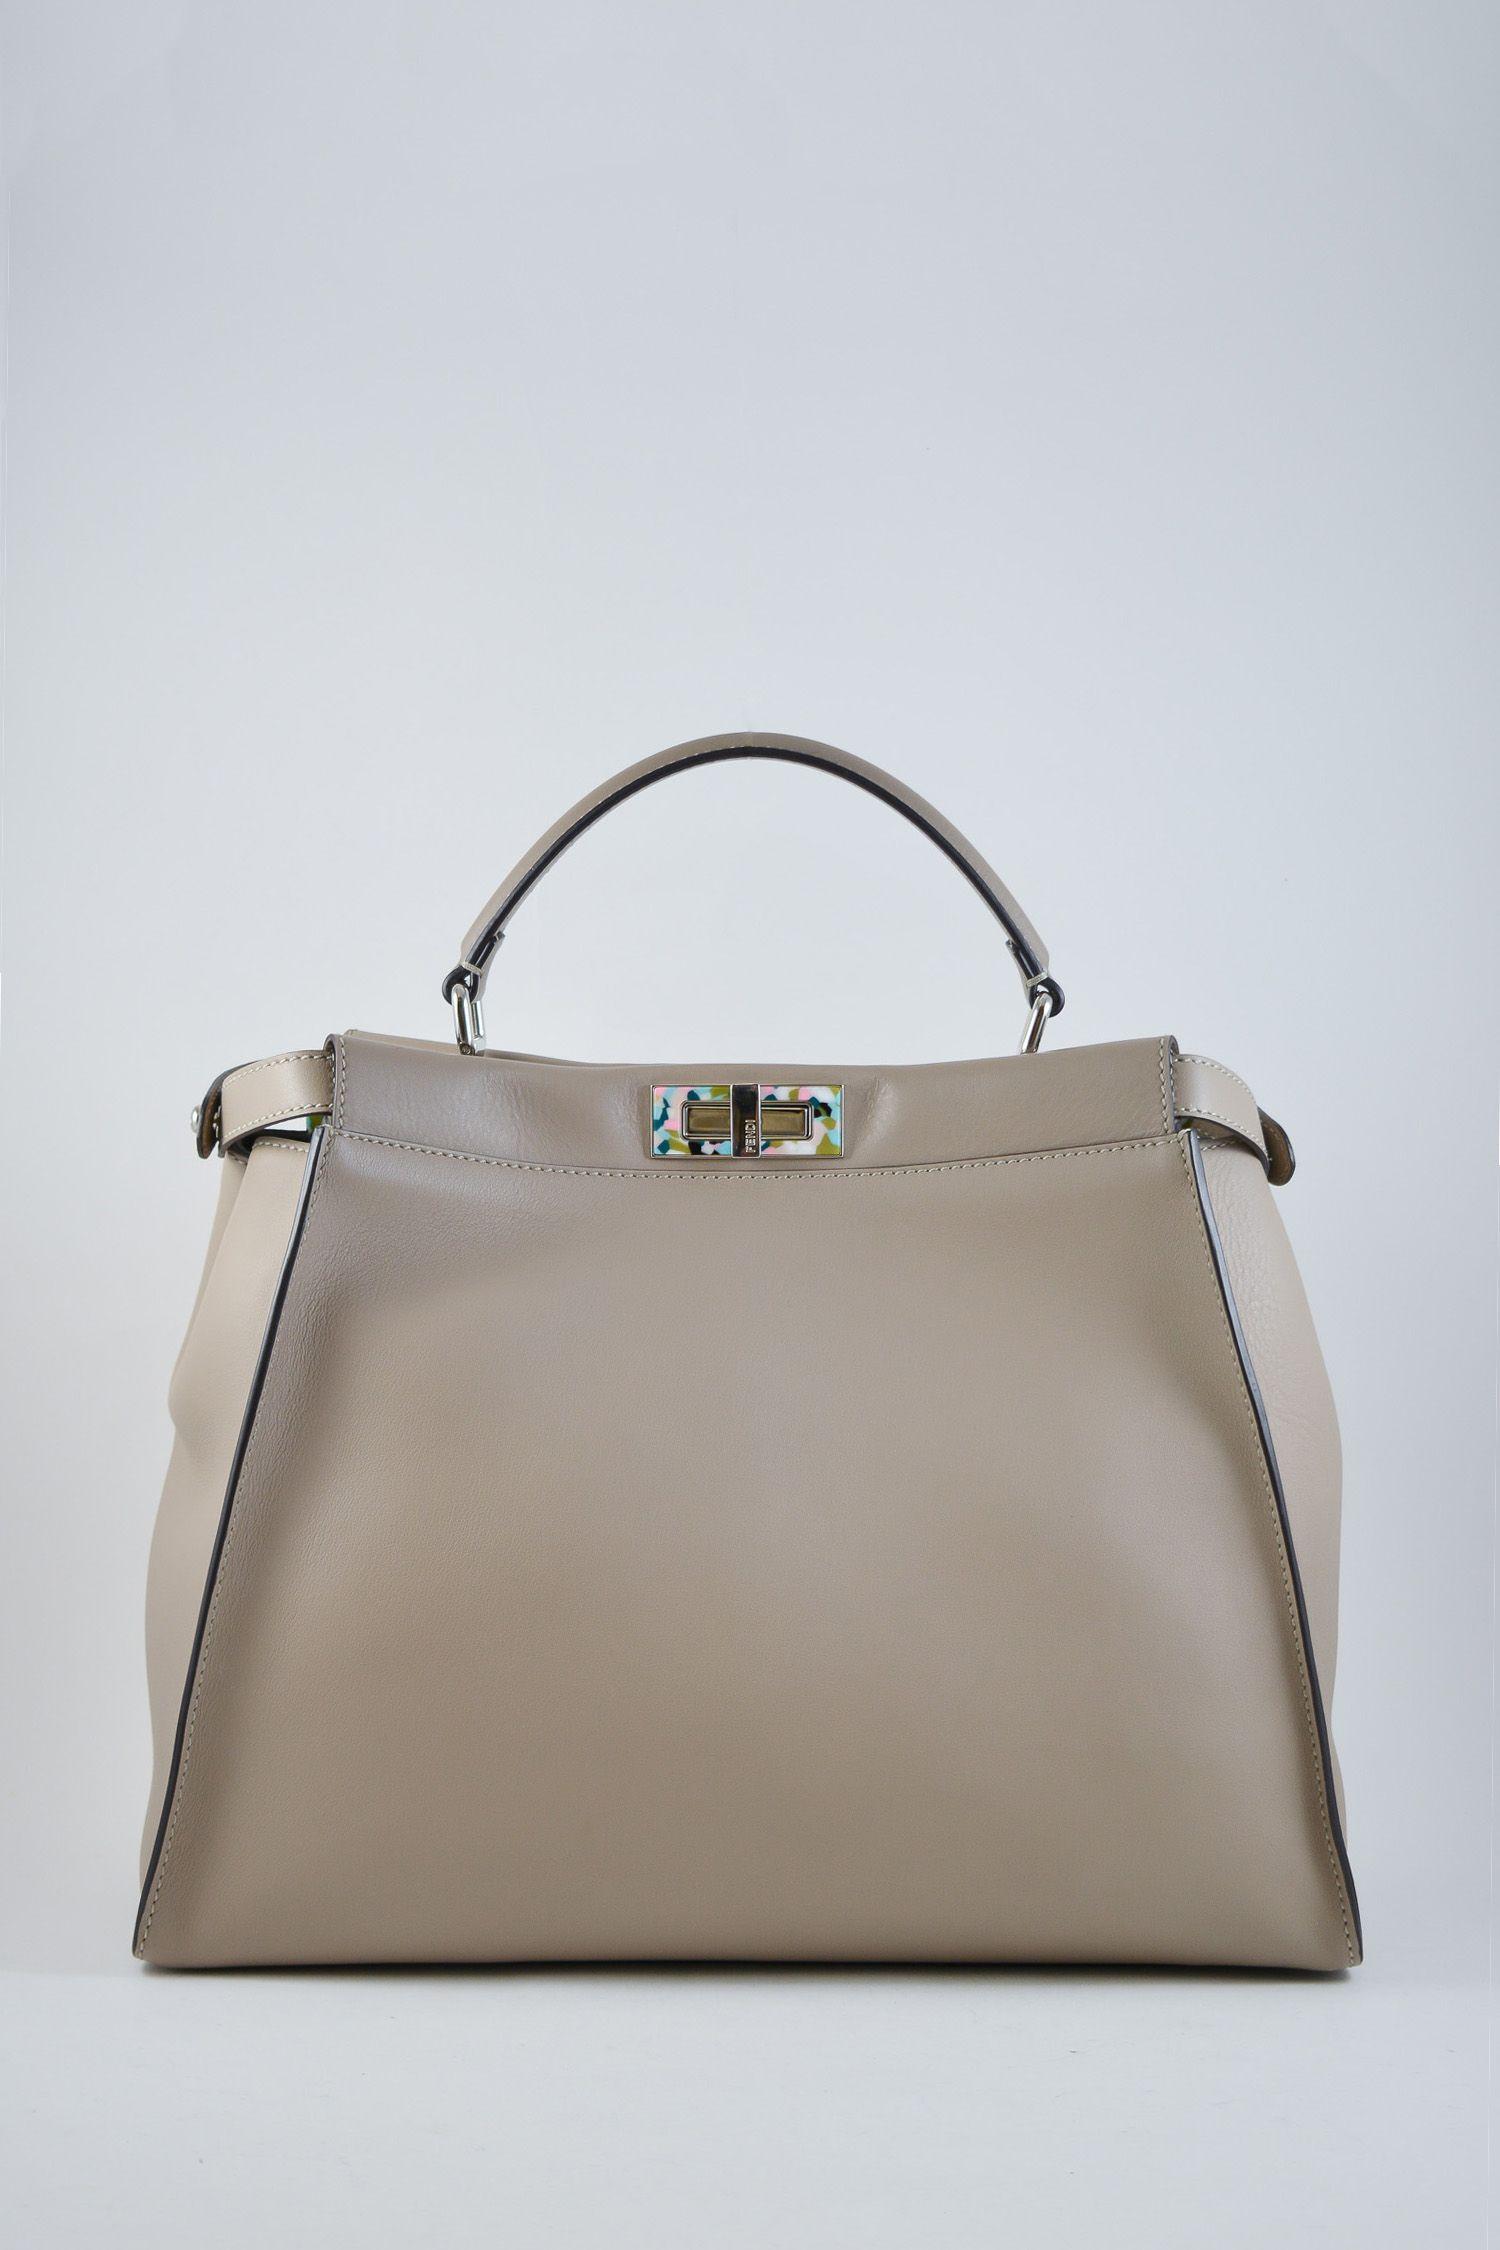 8de8c61e0447 Fendi large beige Peekaboo bag with multi-coloured tortoiseshell accent.  Includes removable shoulder strap